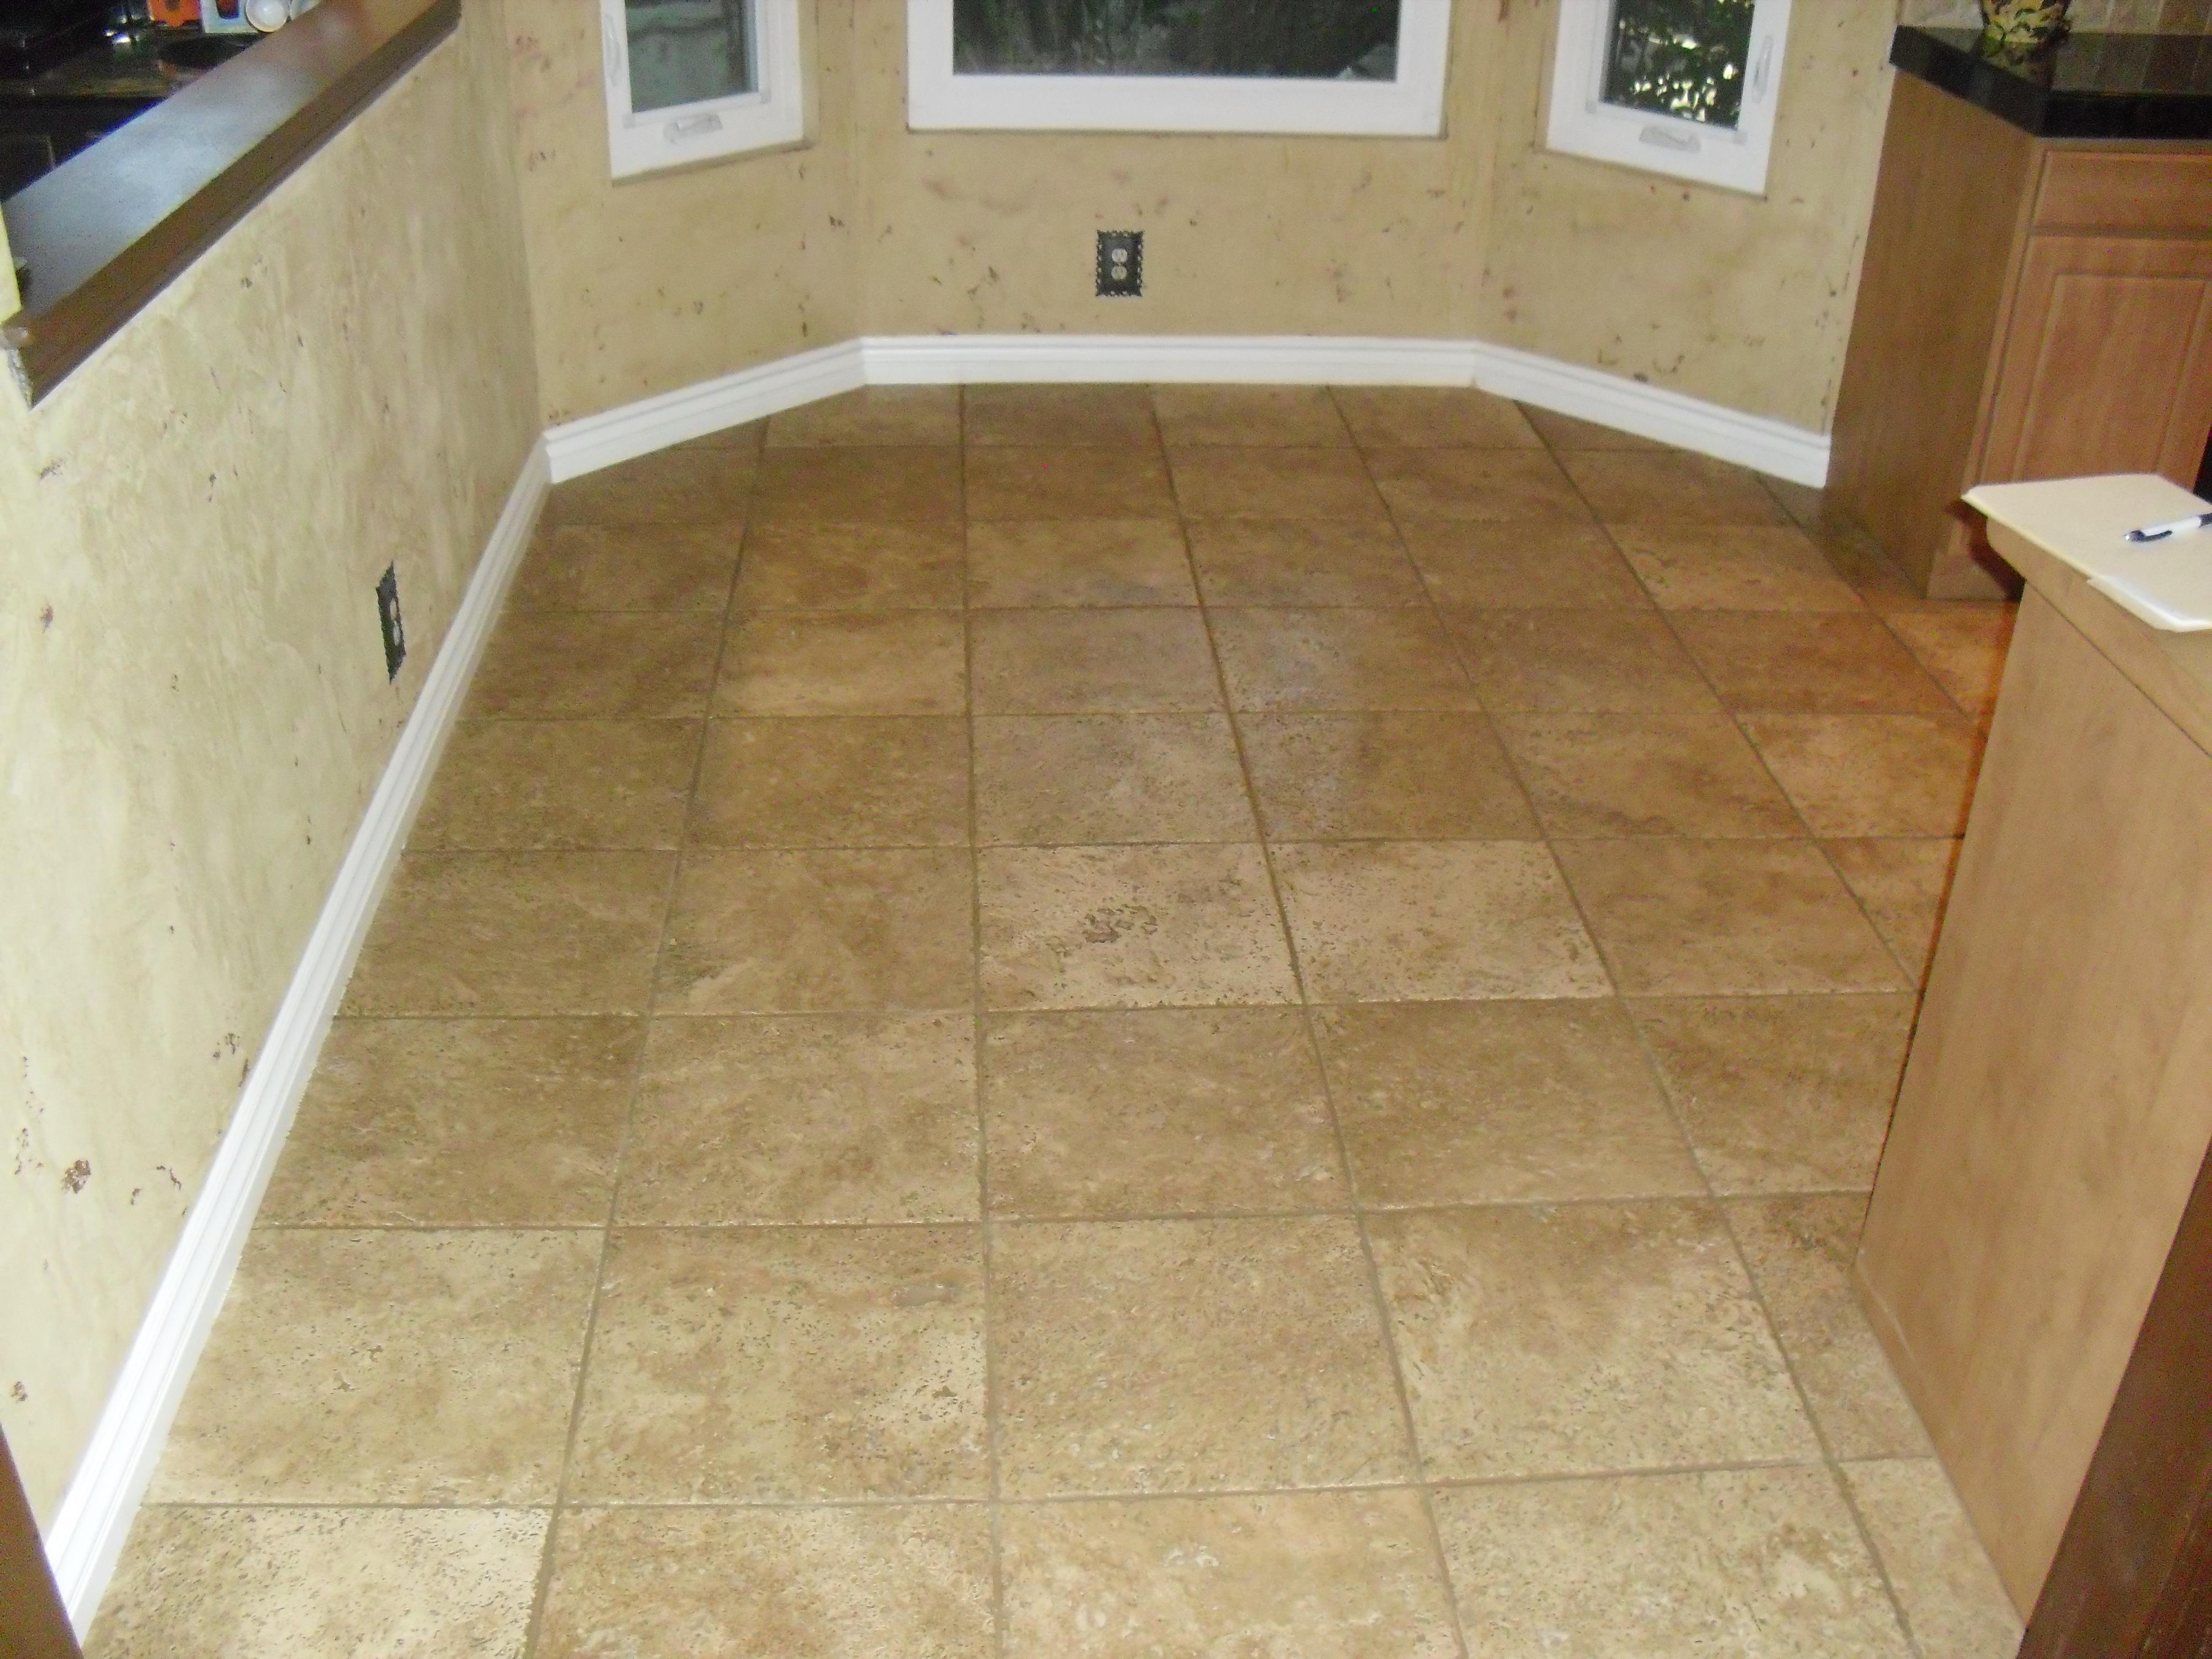 boyles flooring inc in santa clarita ca 661 284 1 With boyle flooring